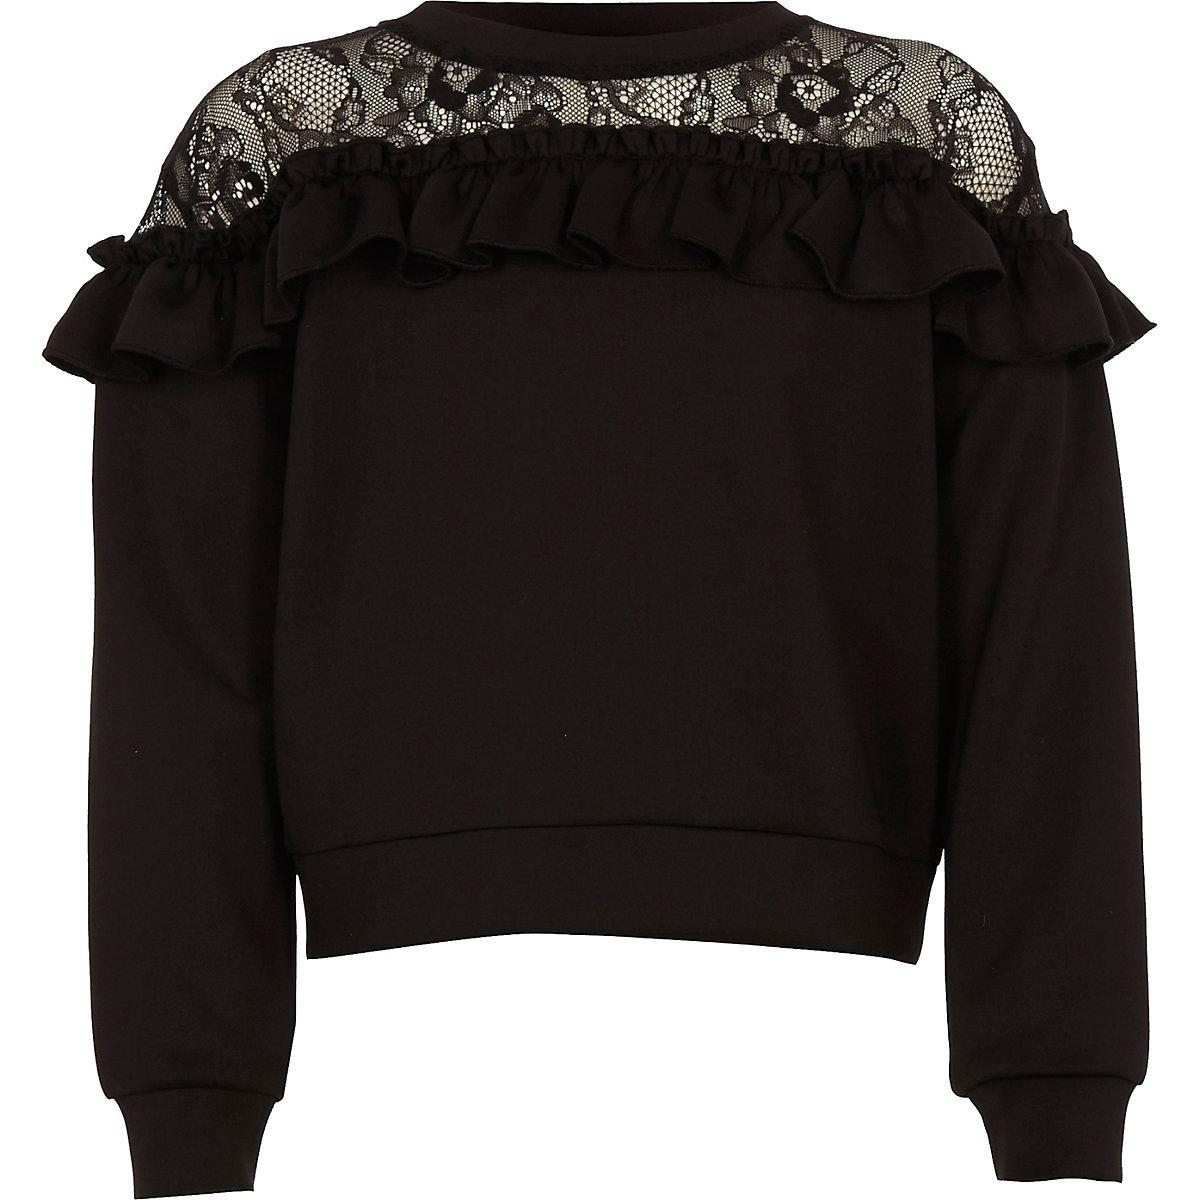 Girls black lace detail long sleeve top